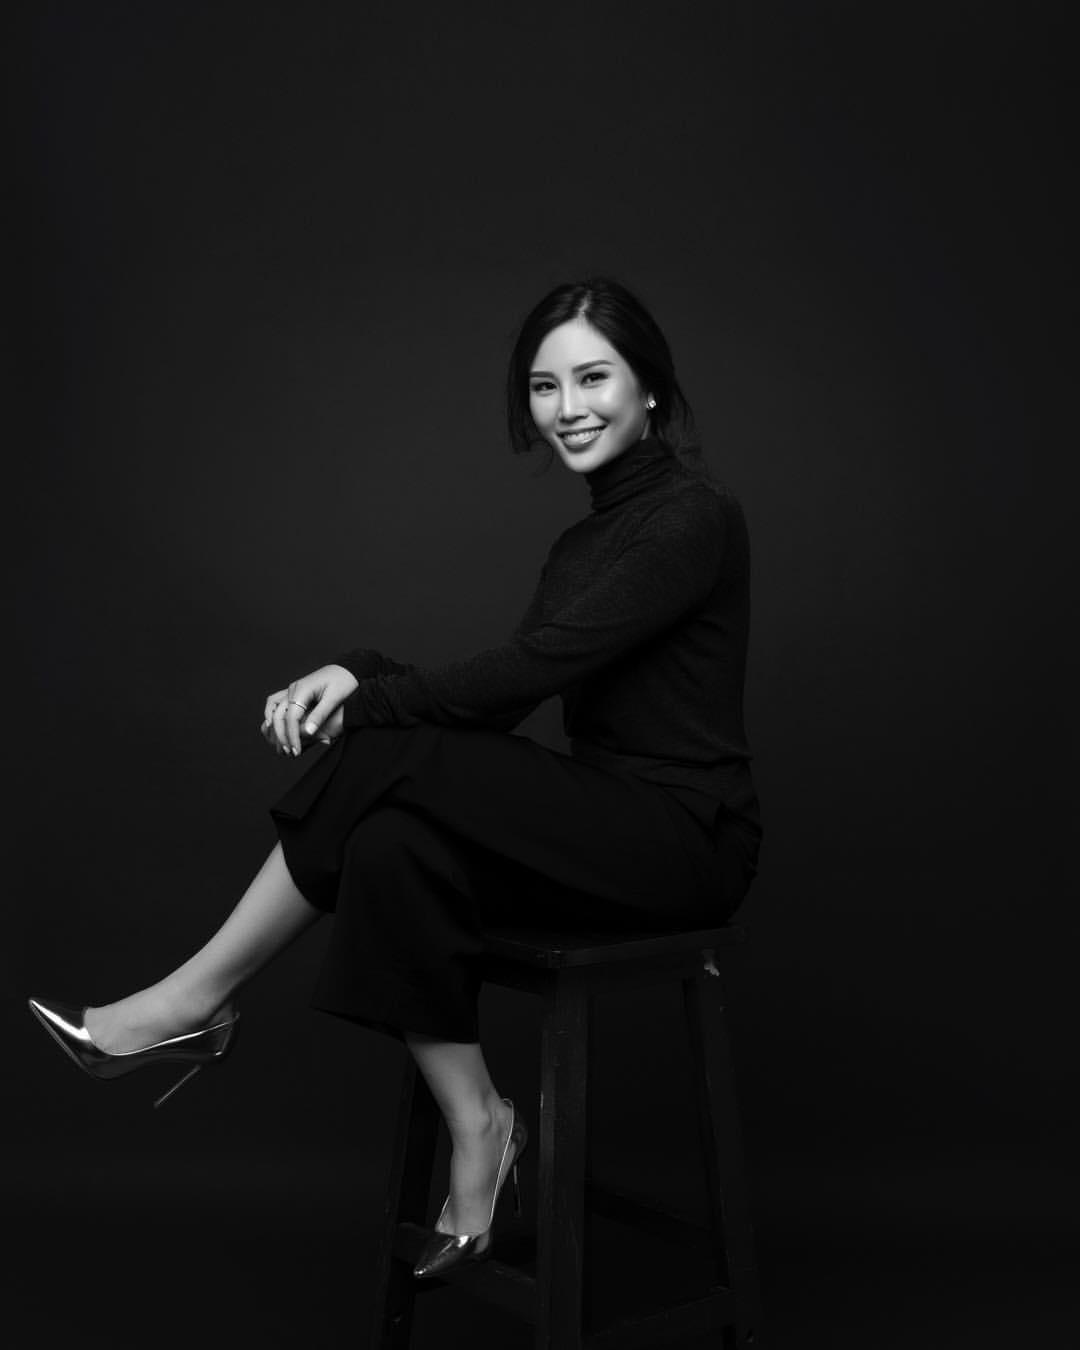 9 Potret Angela Tanoesoedibjo, calon menteri Jokowi yang penuh pesona